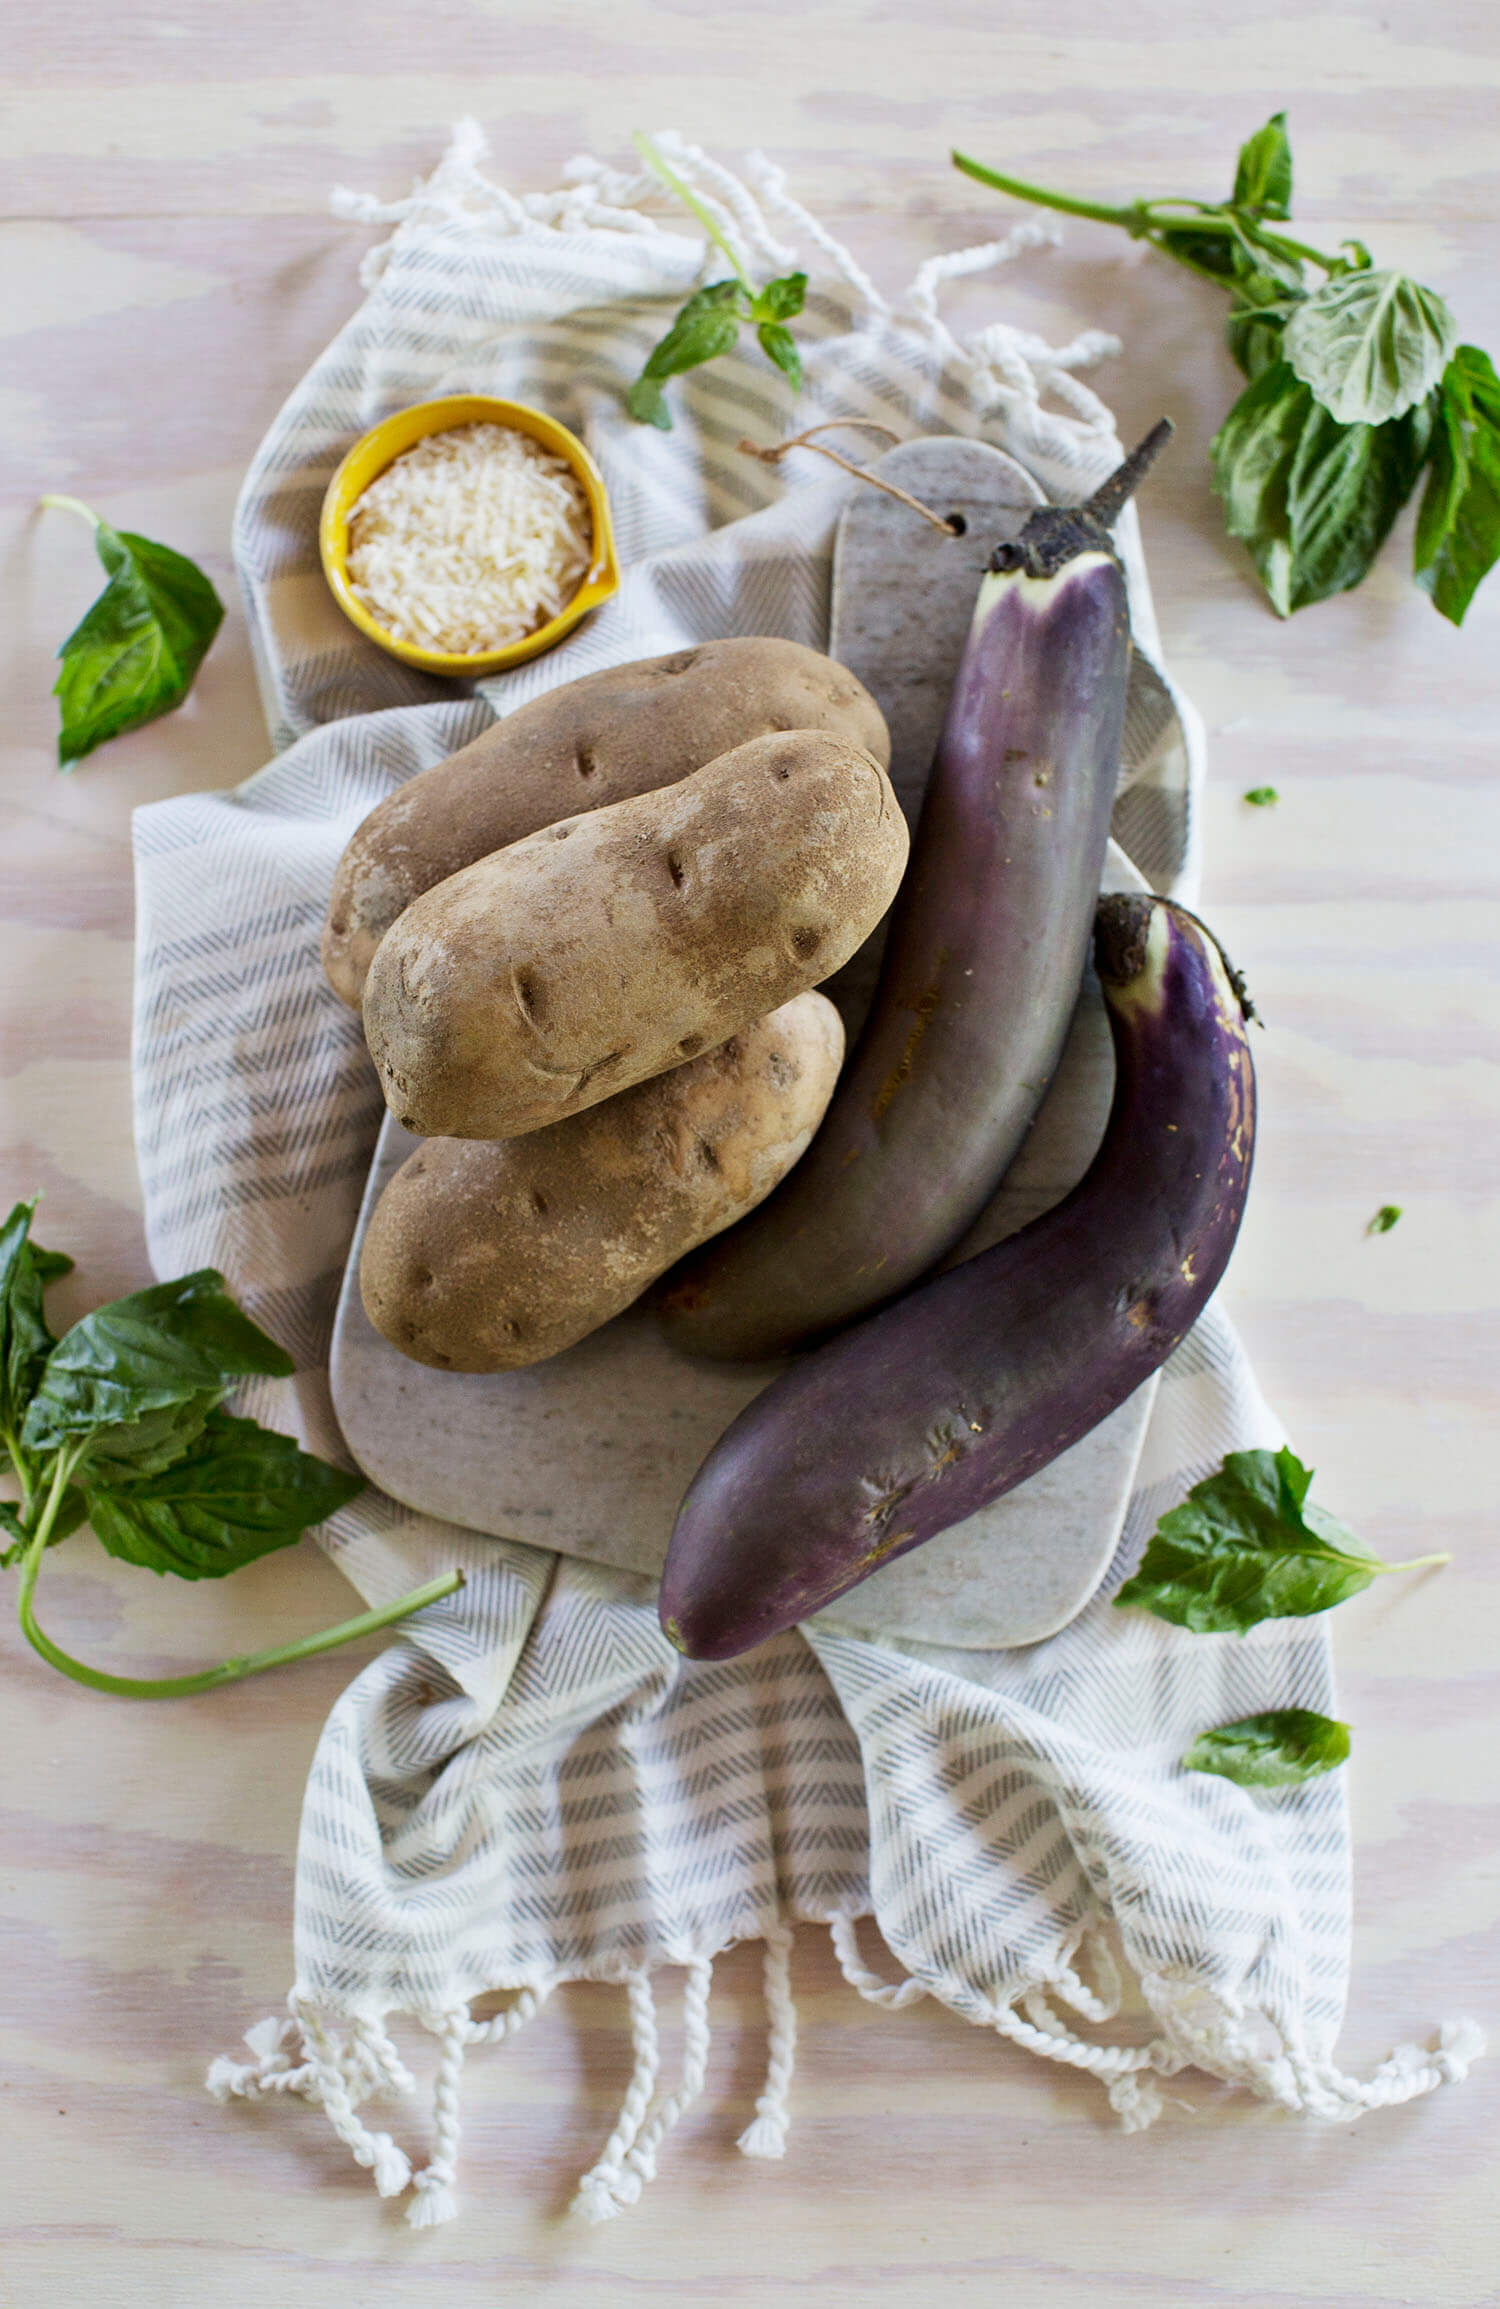 Eggplant parm ingredients